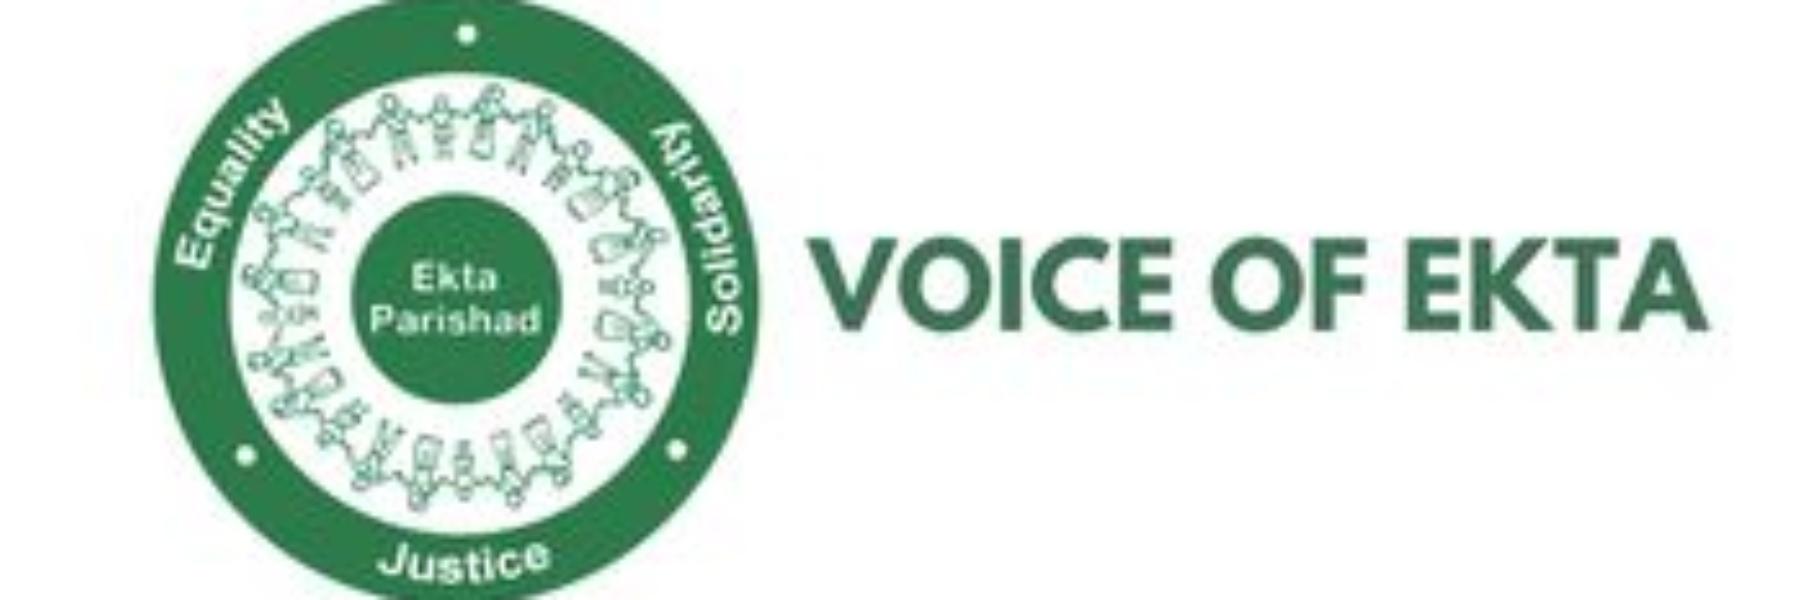 Voice of Ekta